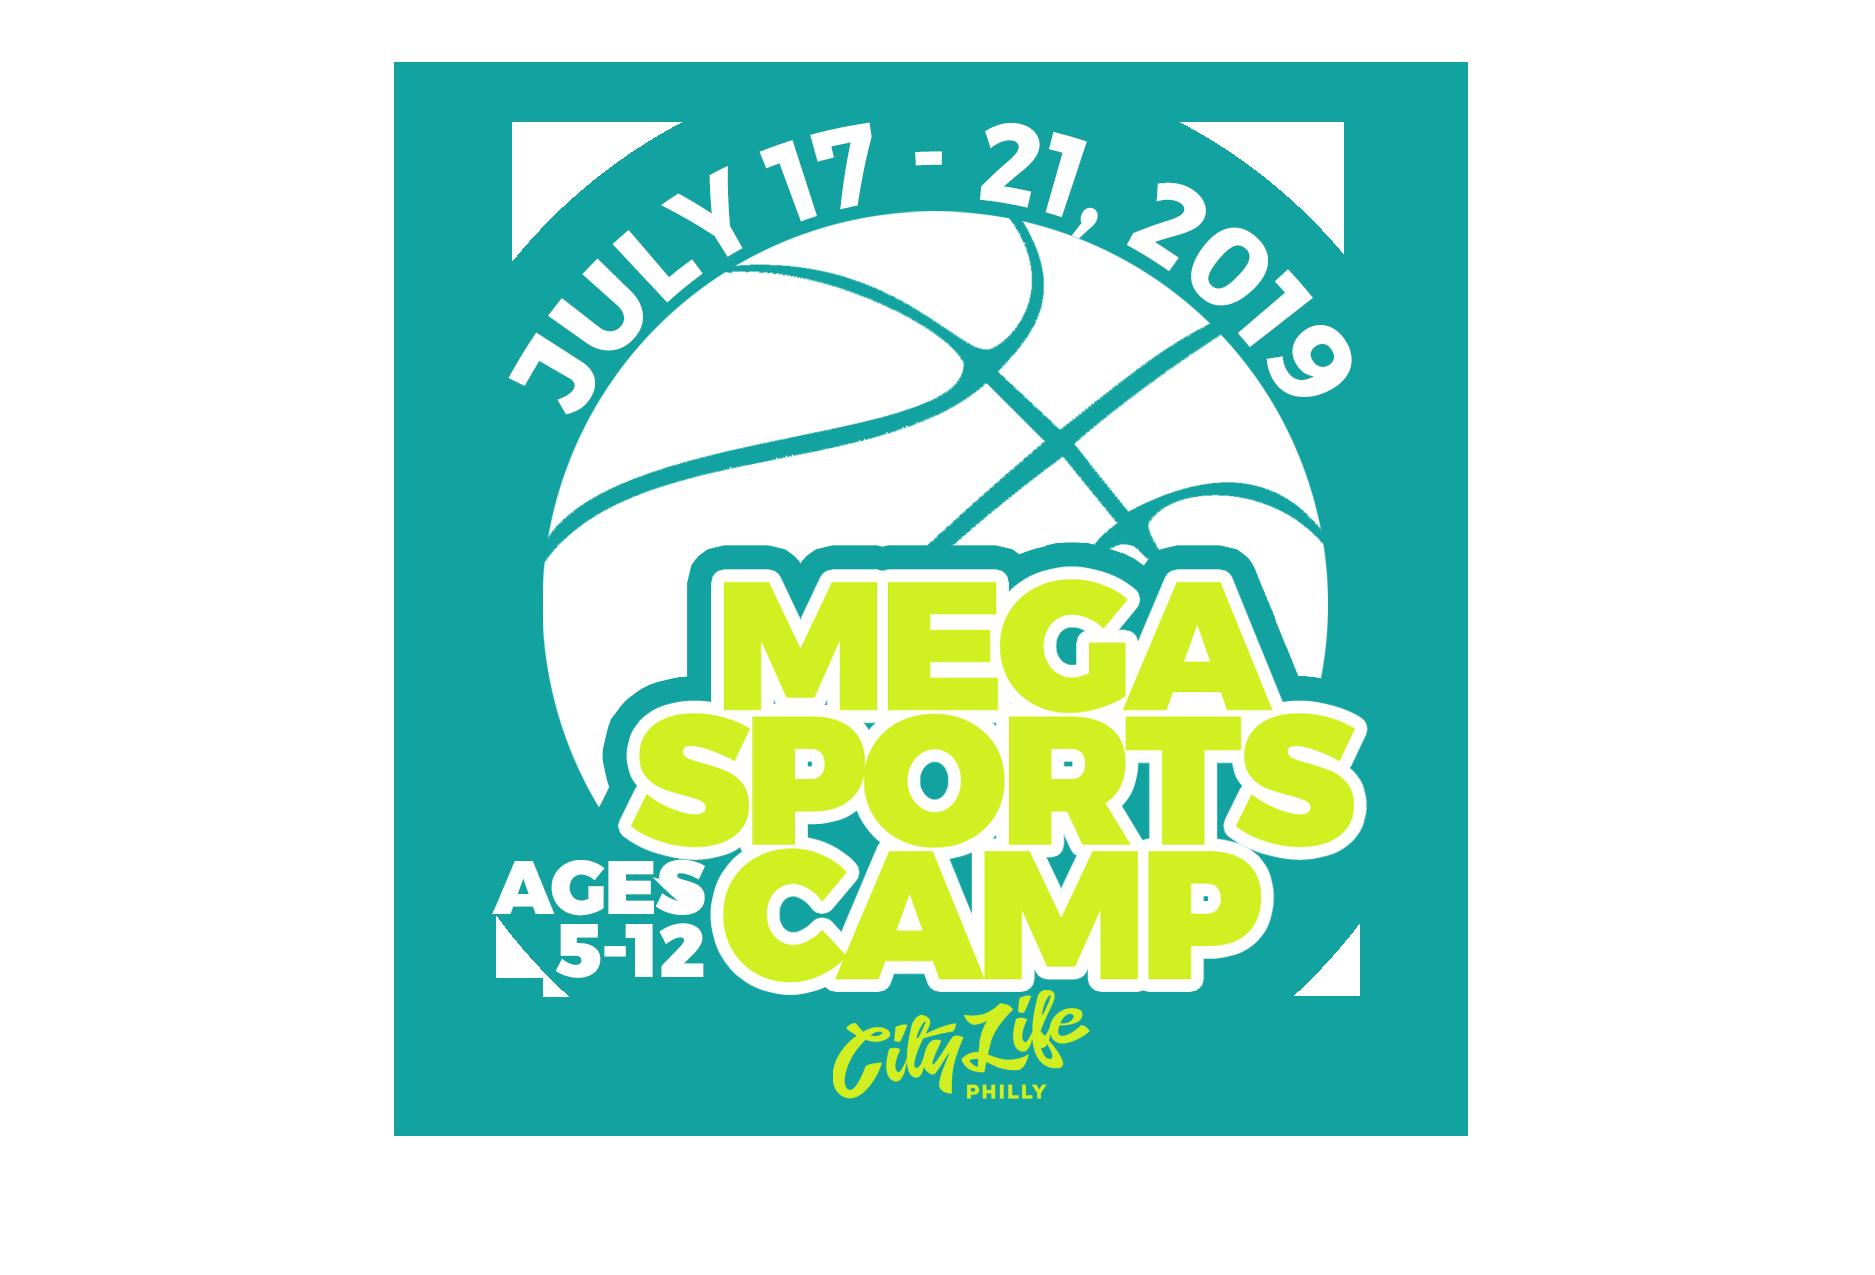 2019+05+mega+sports+camp+logo+web.png